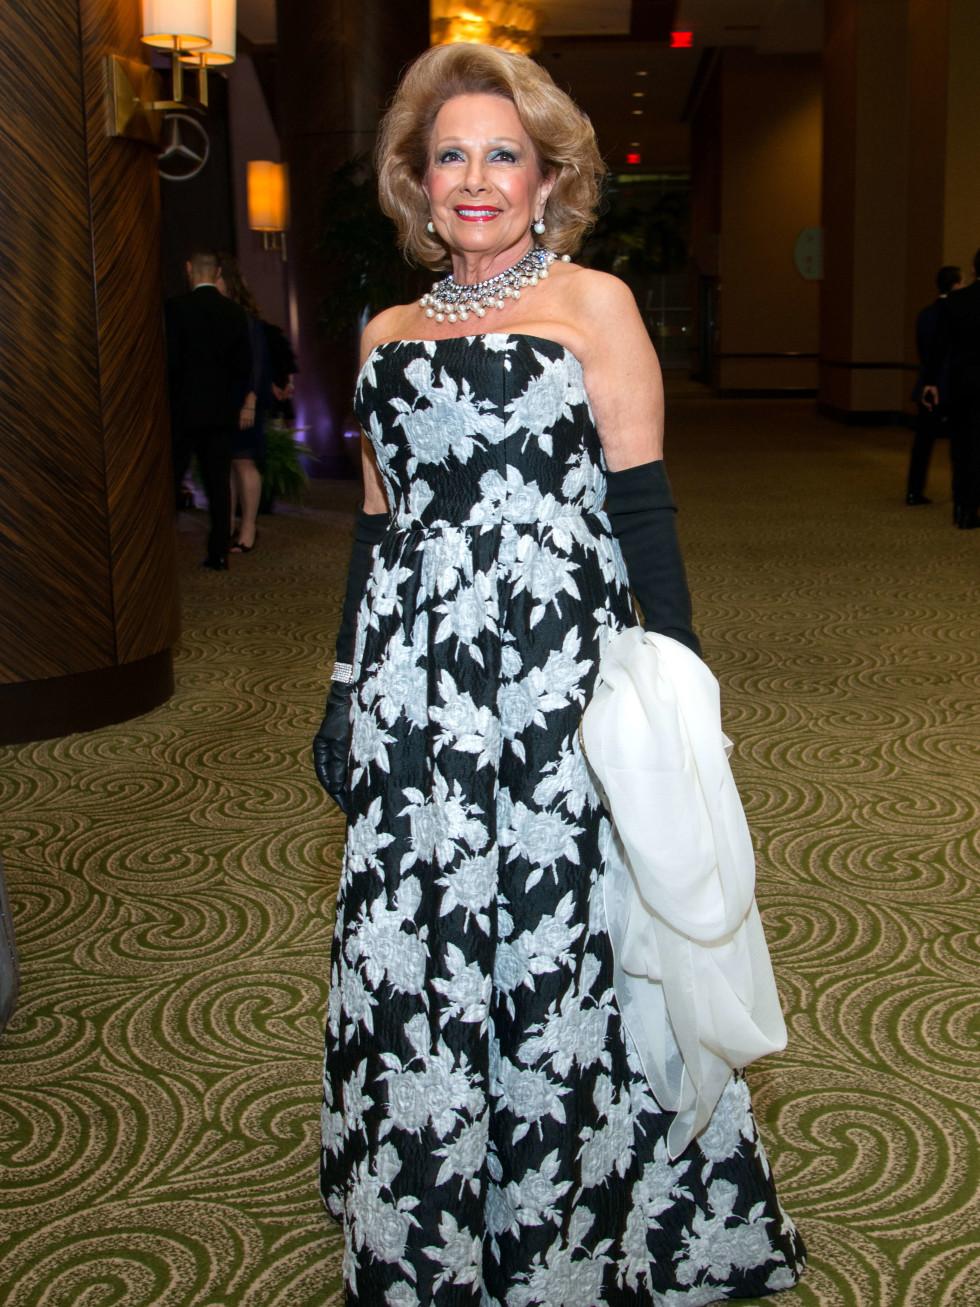 Houston, Women of Distinction fashionable gowns, Feb 2017, Philamena Baird